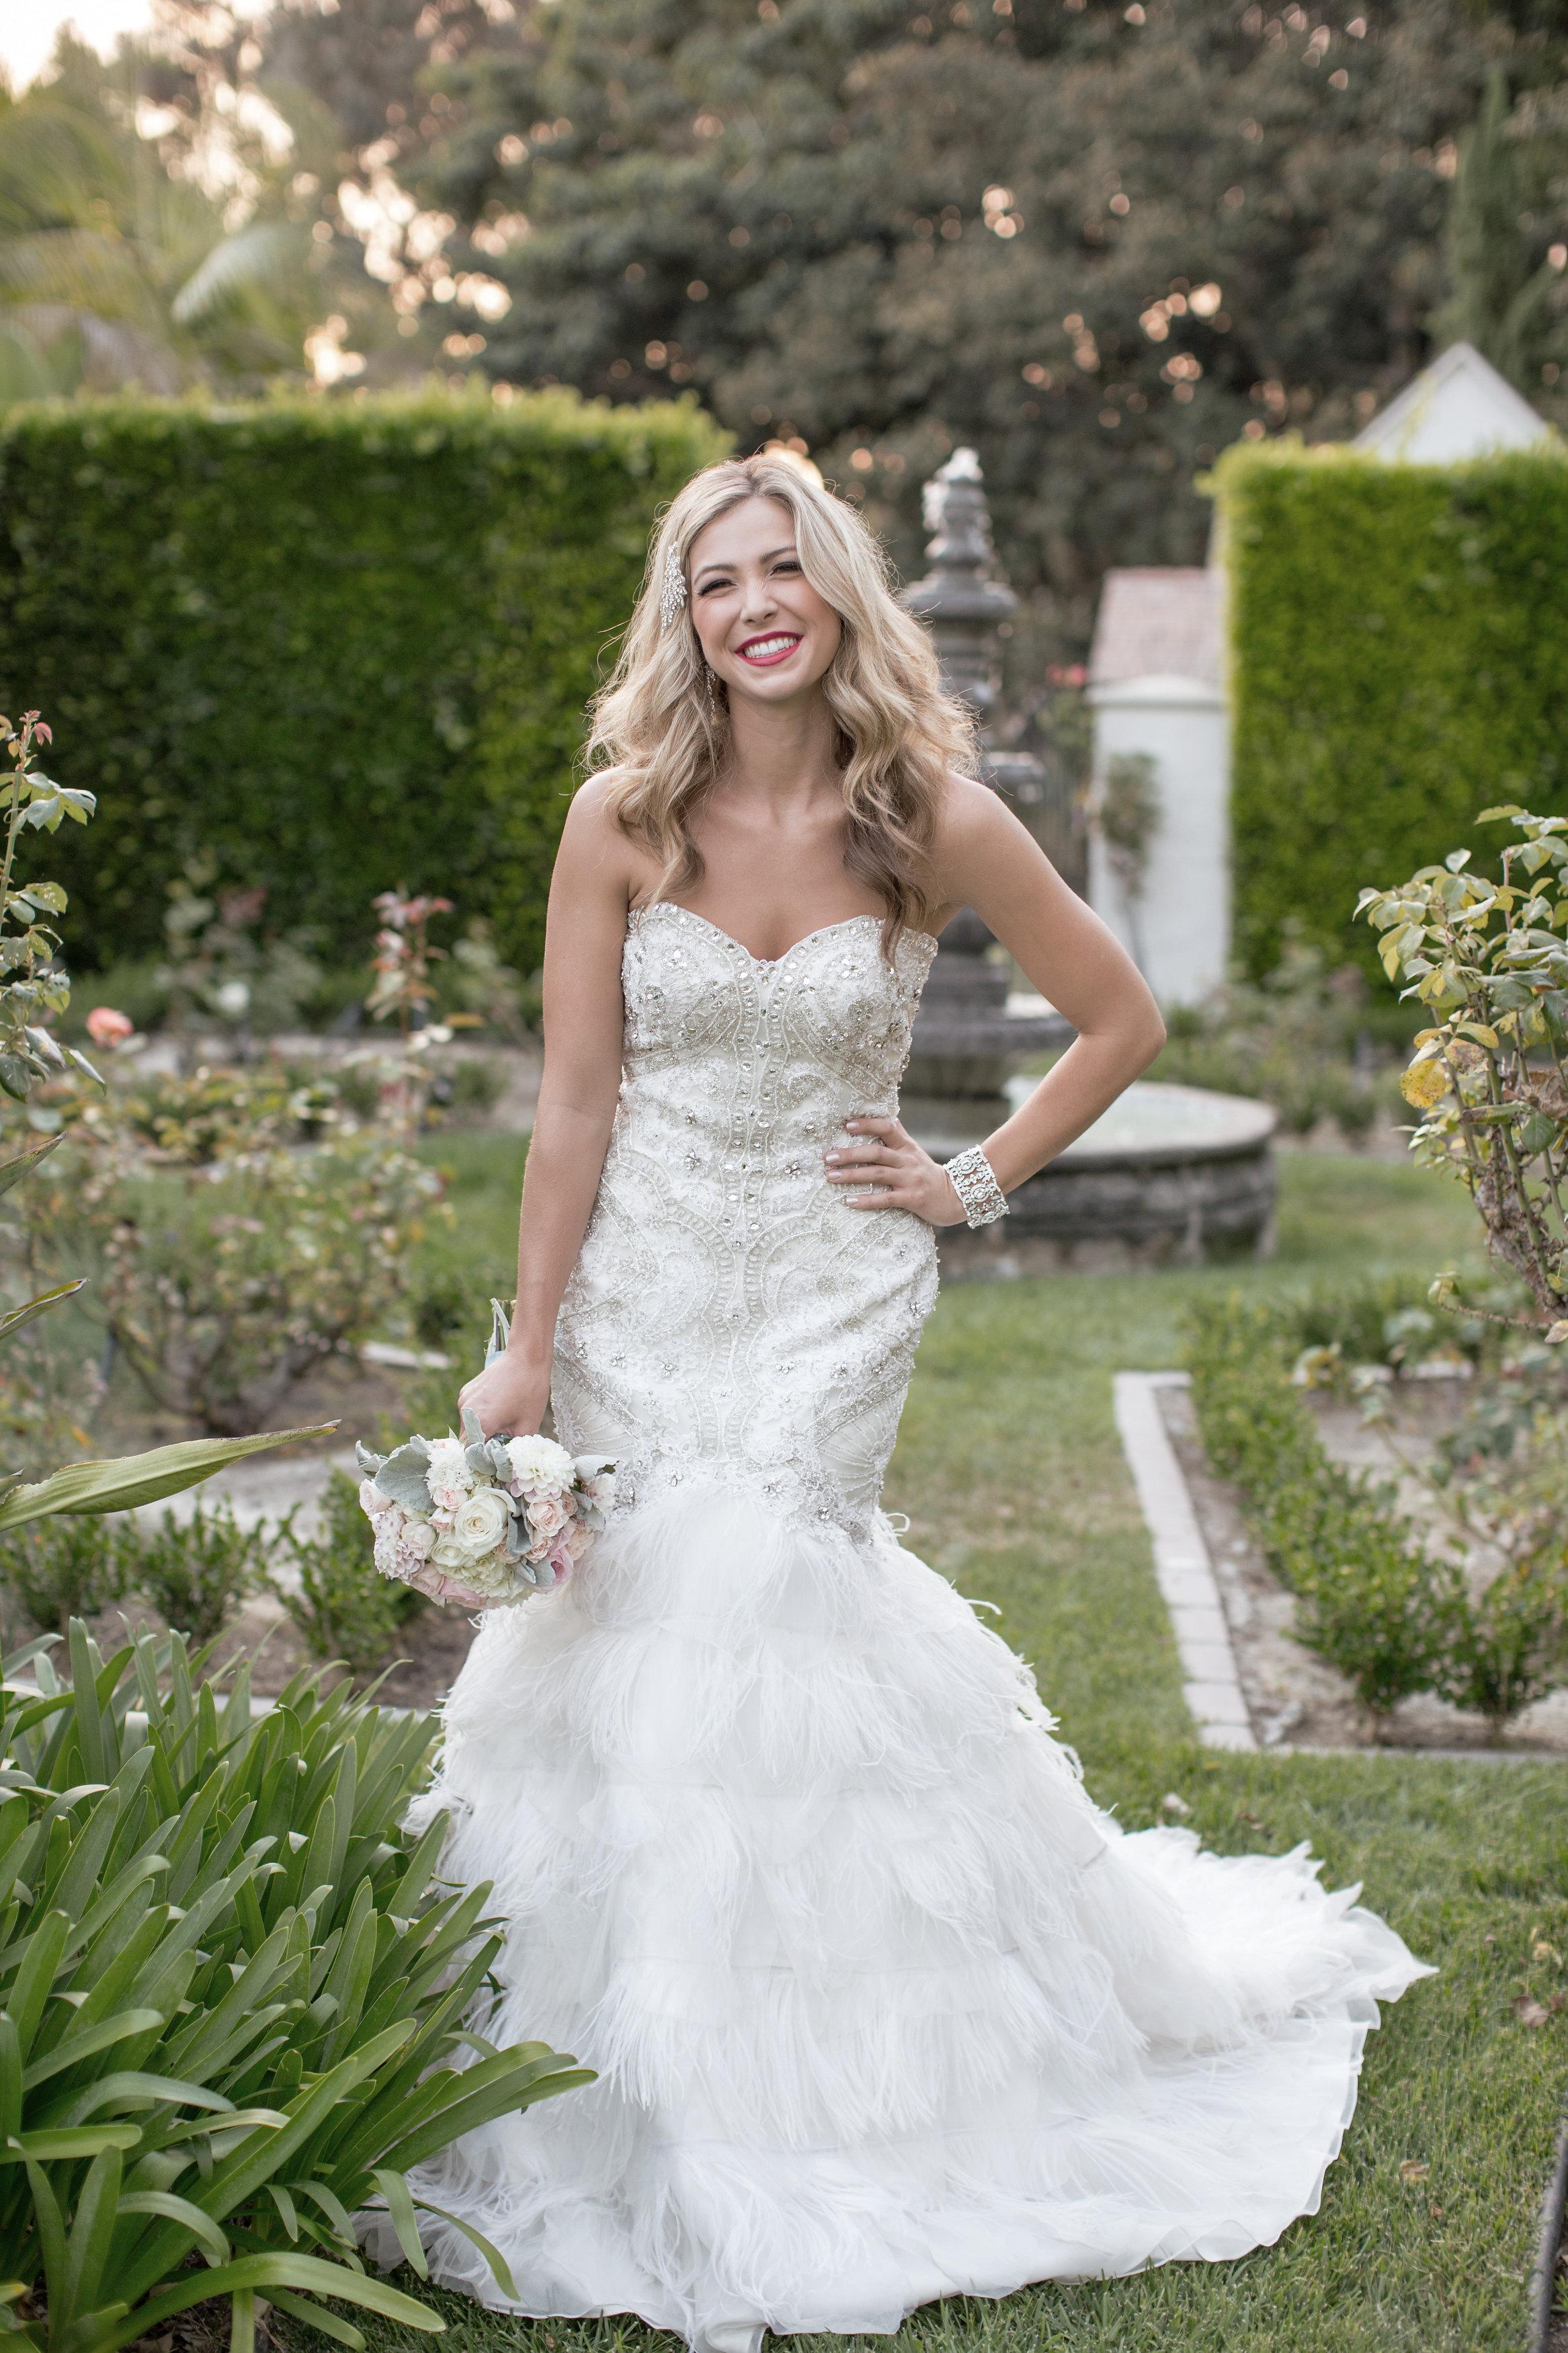 David Manning Photographer Morgan Leigh Boberg San Diego Wedding dress